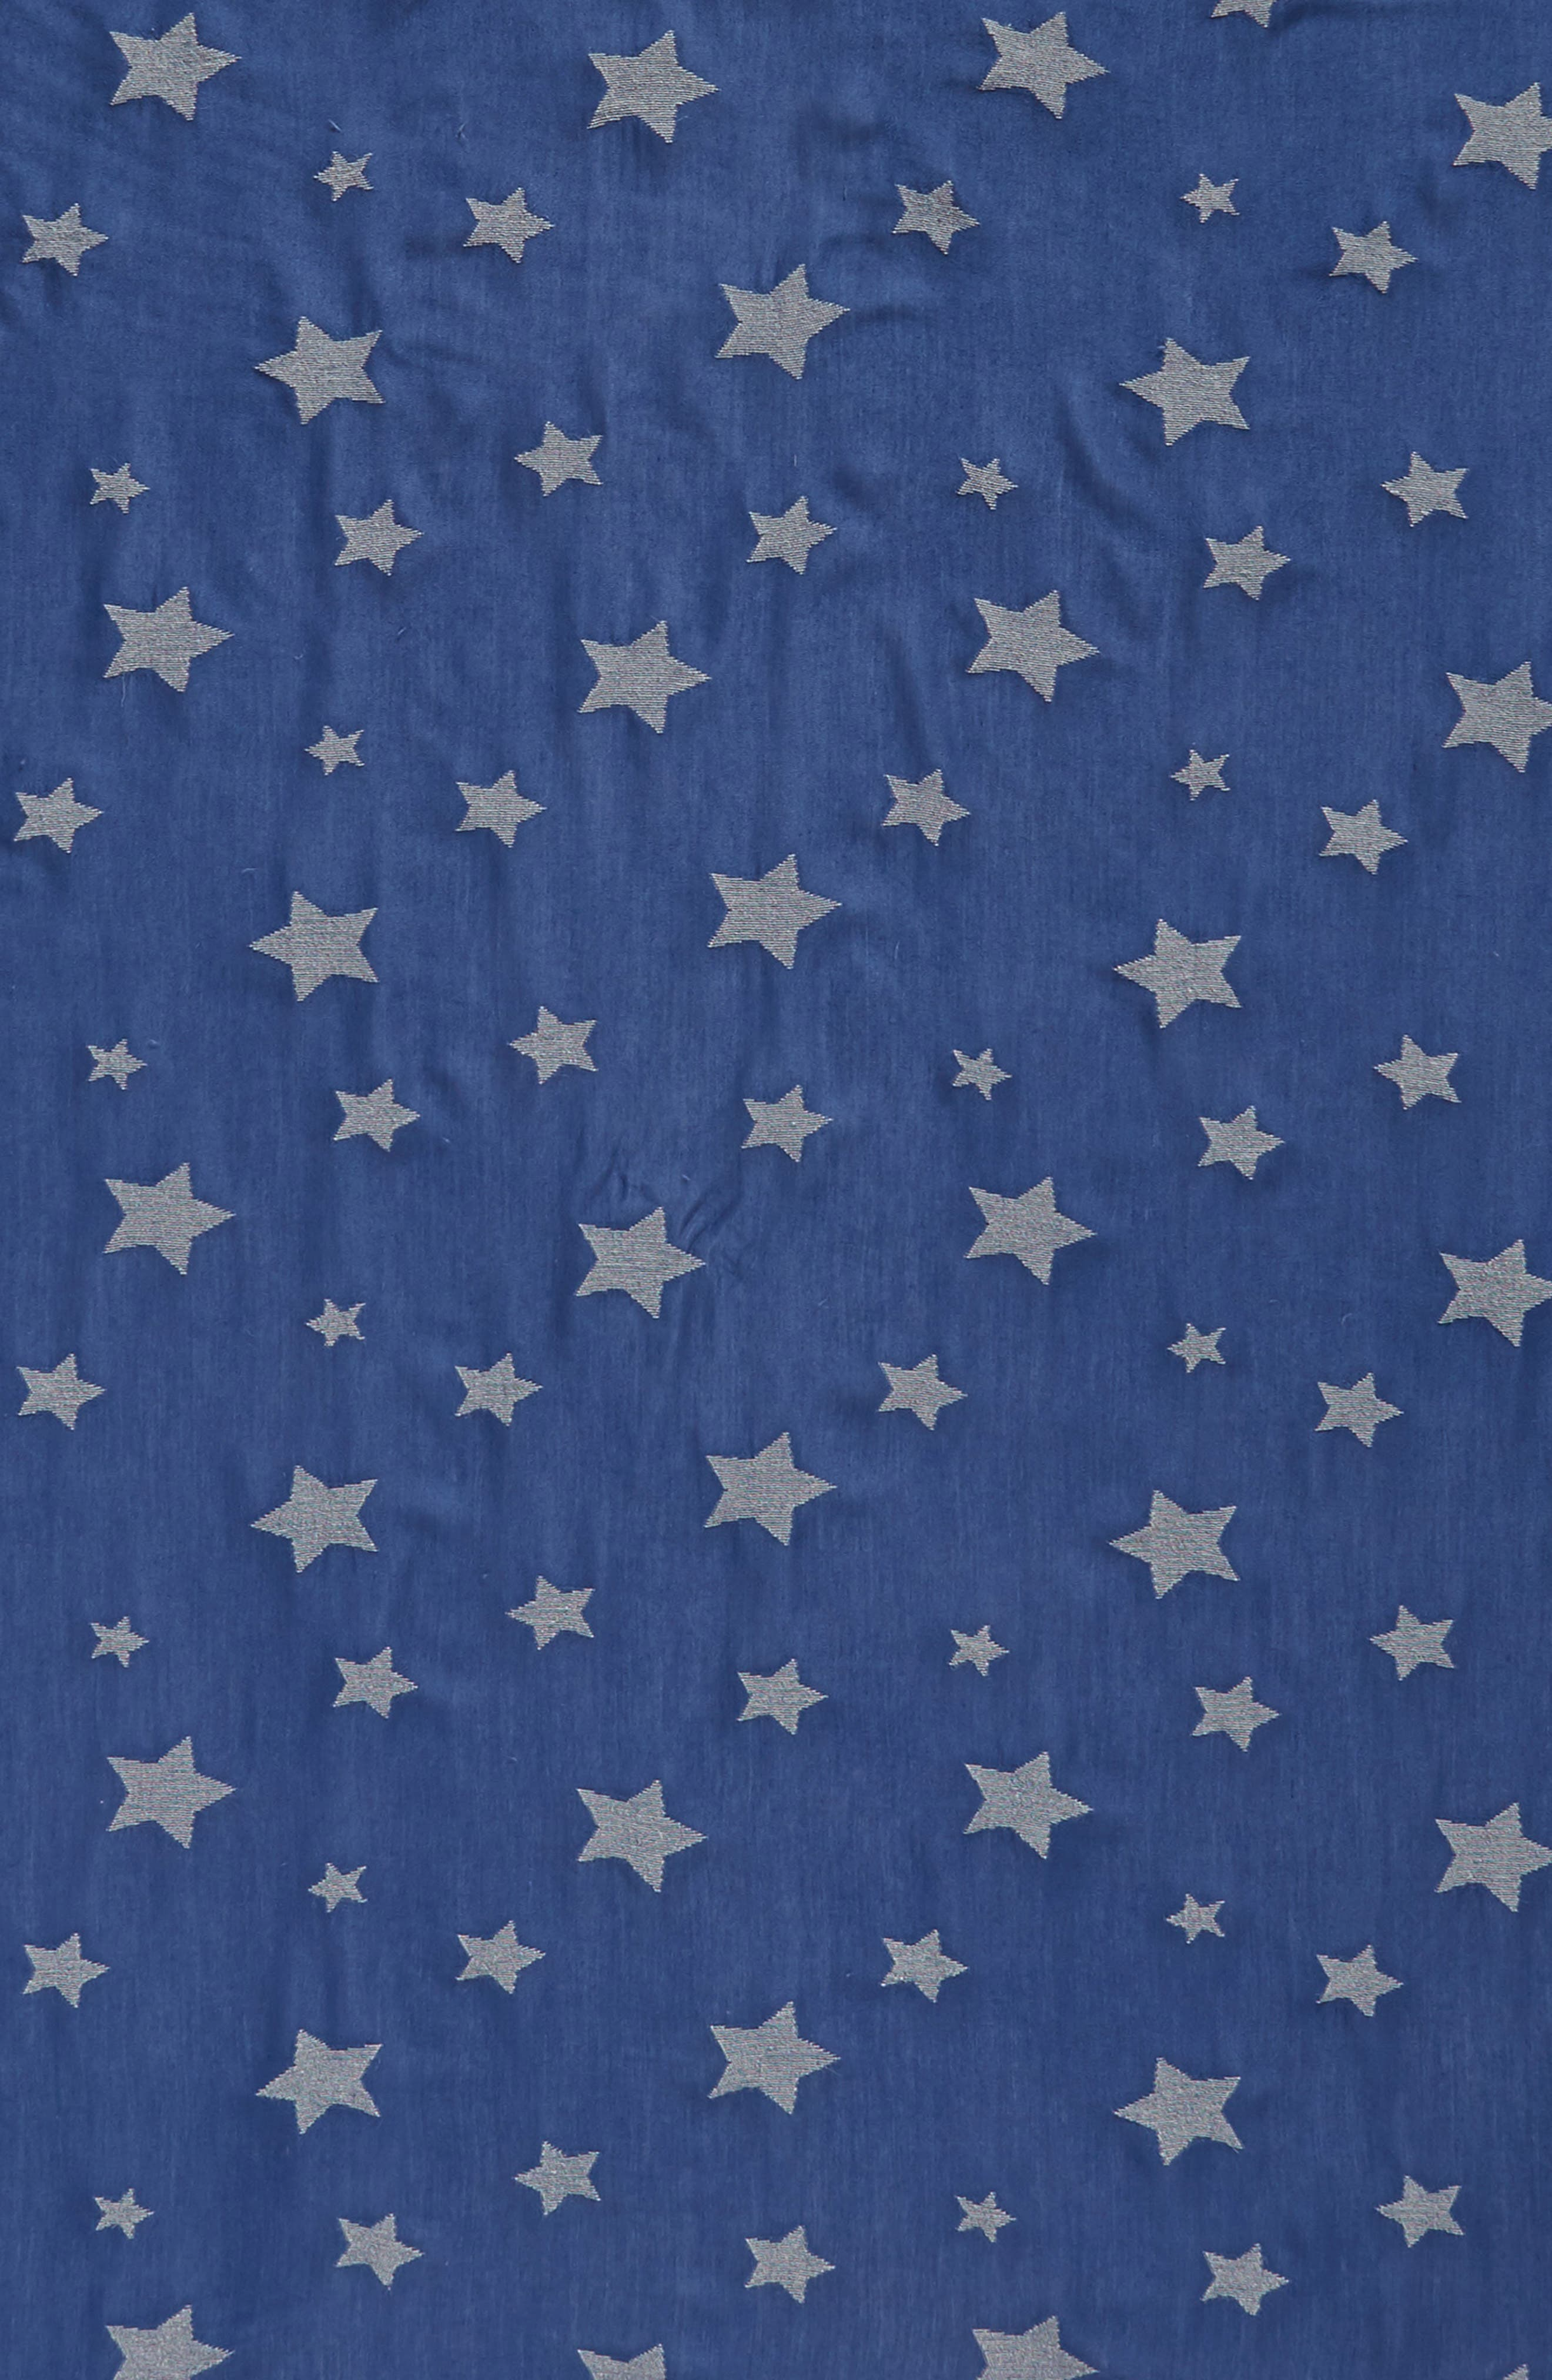 Star Scarf,                             Alternate thumbnail 4, color,                             410